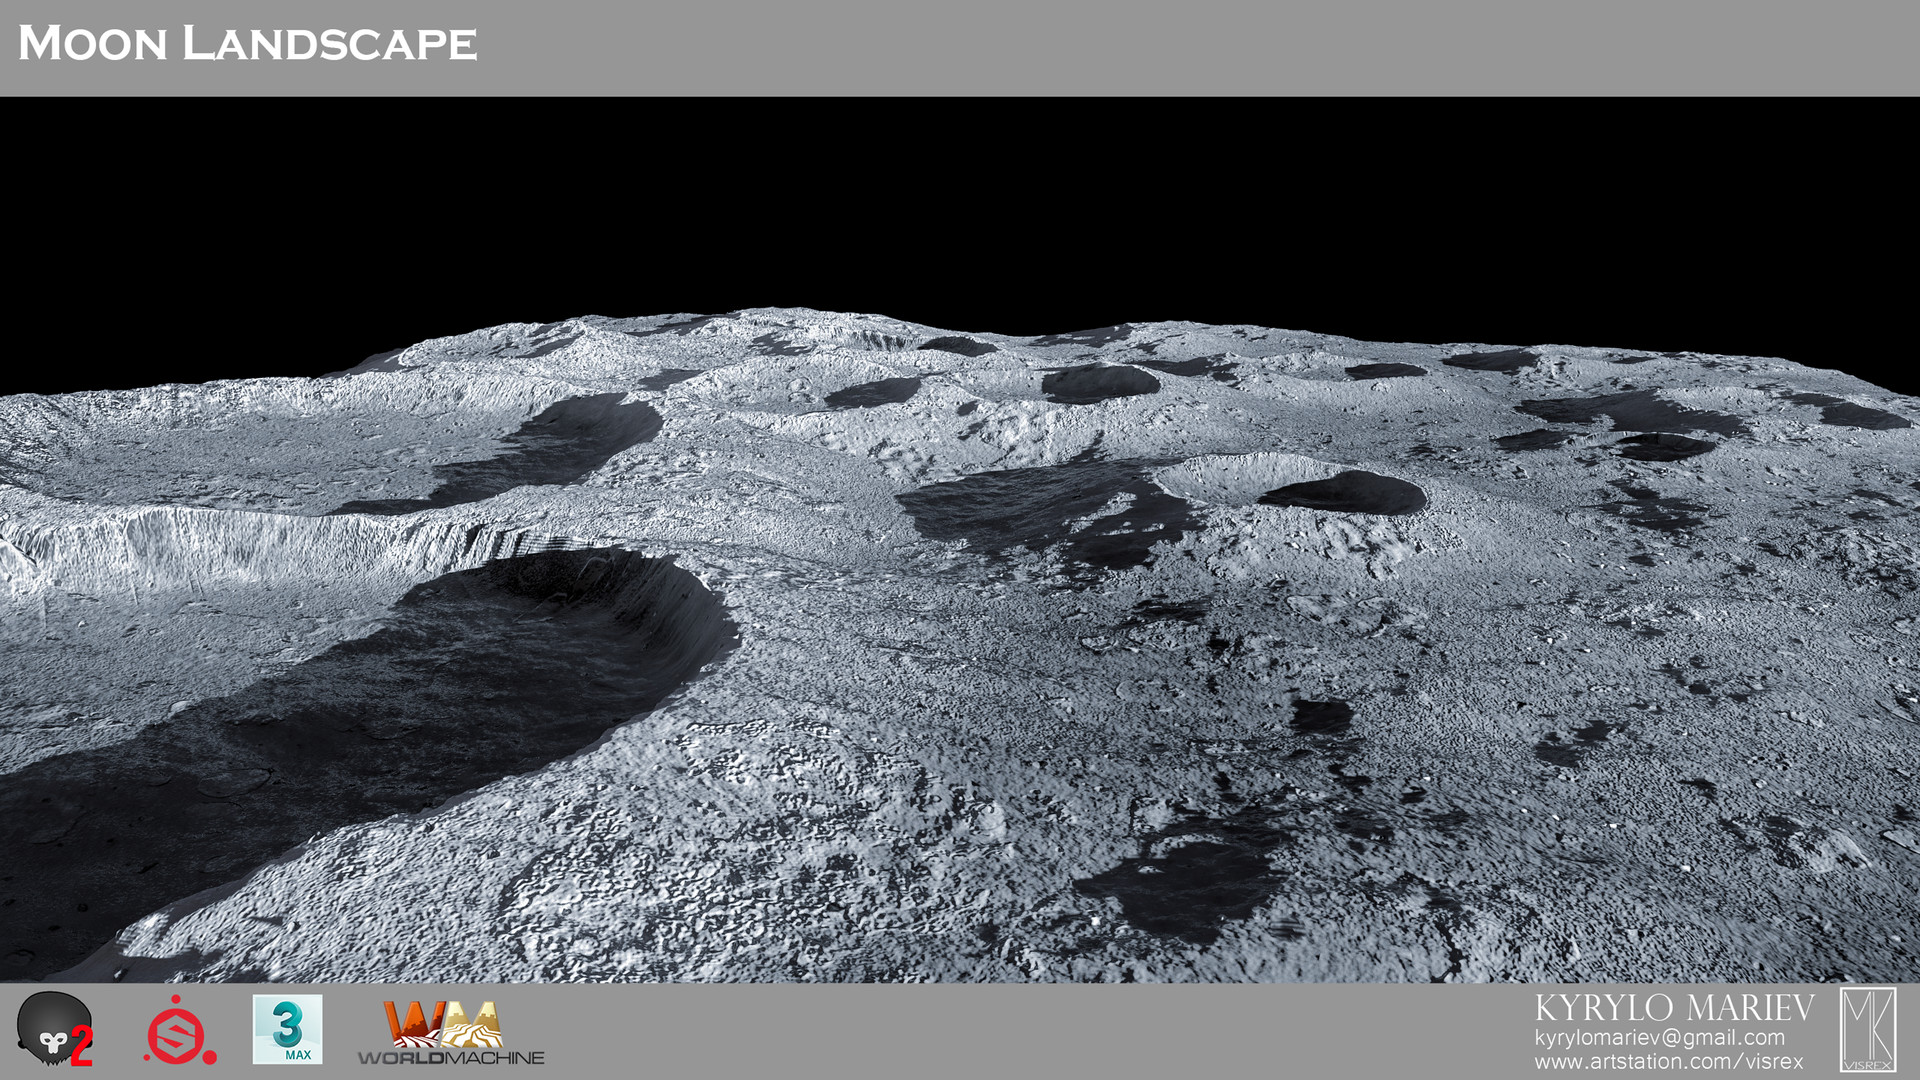 ArtStation - Moon Landscape (World Machine), Kyrylo Mariev